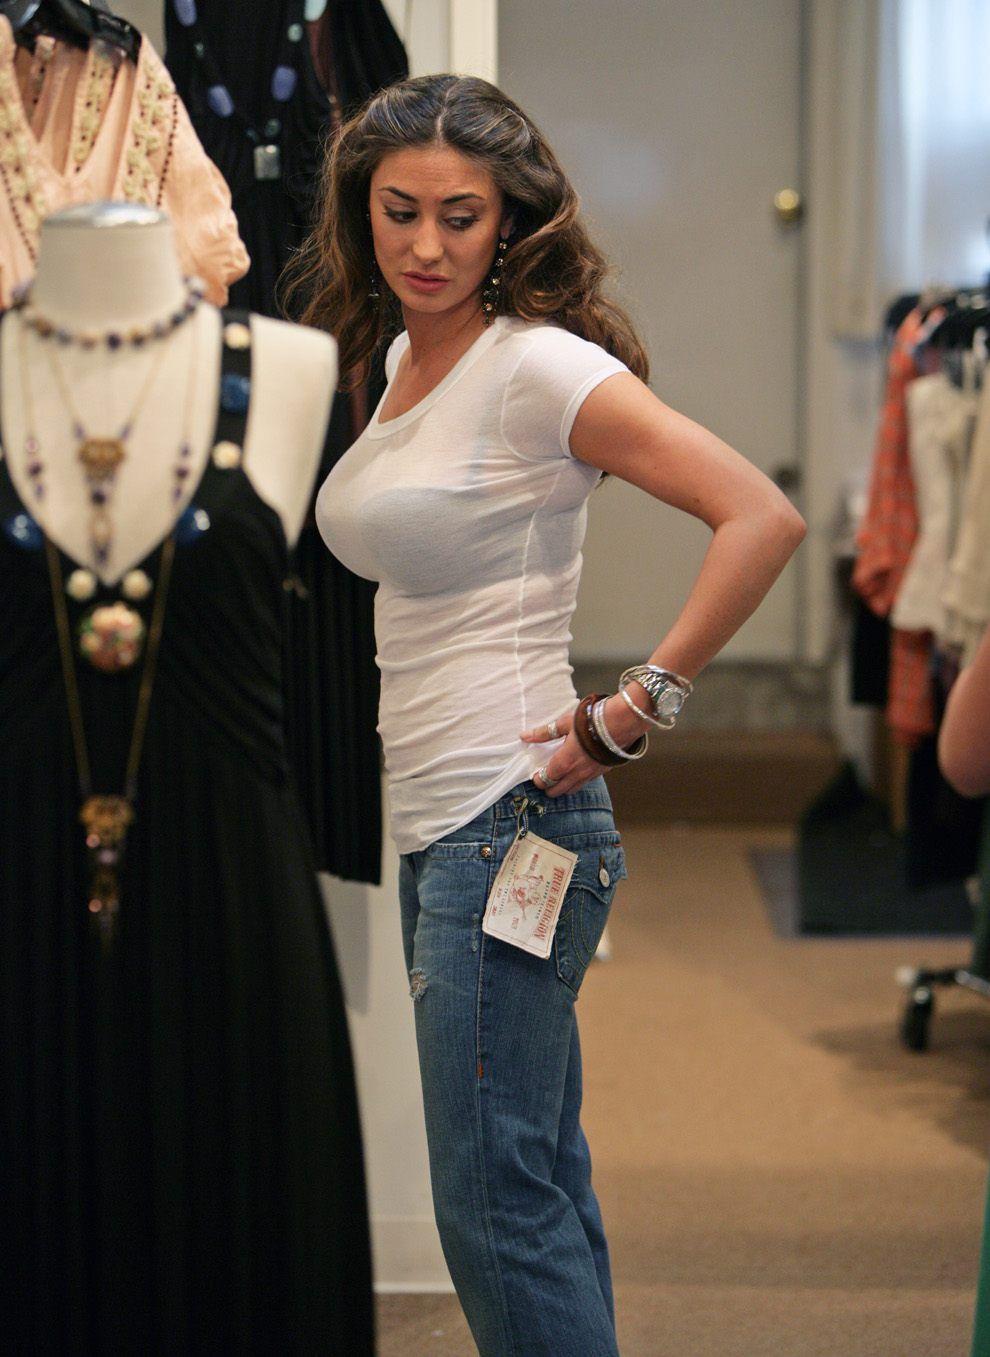 Voyeur busty girl | Womens fashion | Pinterest | Girls